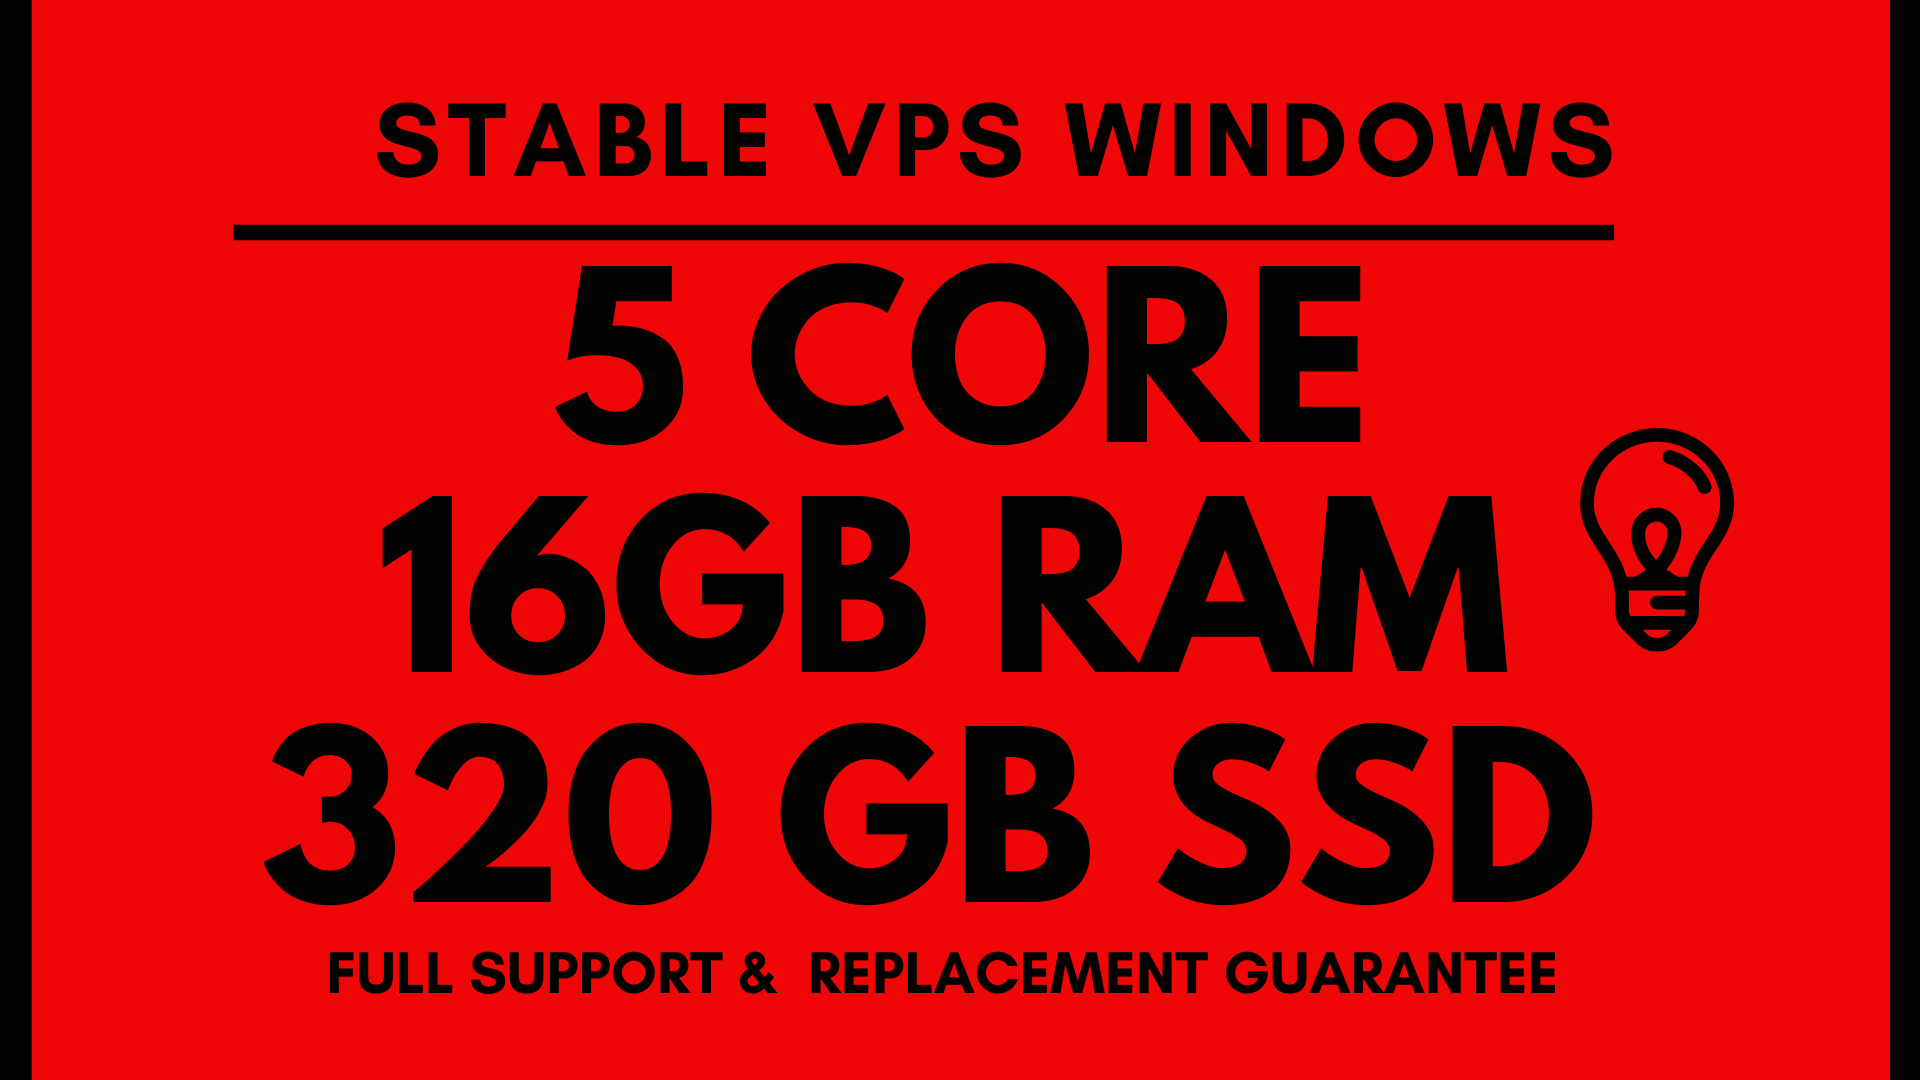 STABLE Windows VPS RDP 16GB RAM 5CORE 320GB SSD